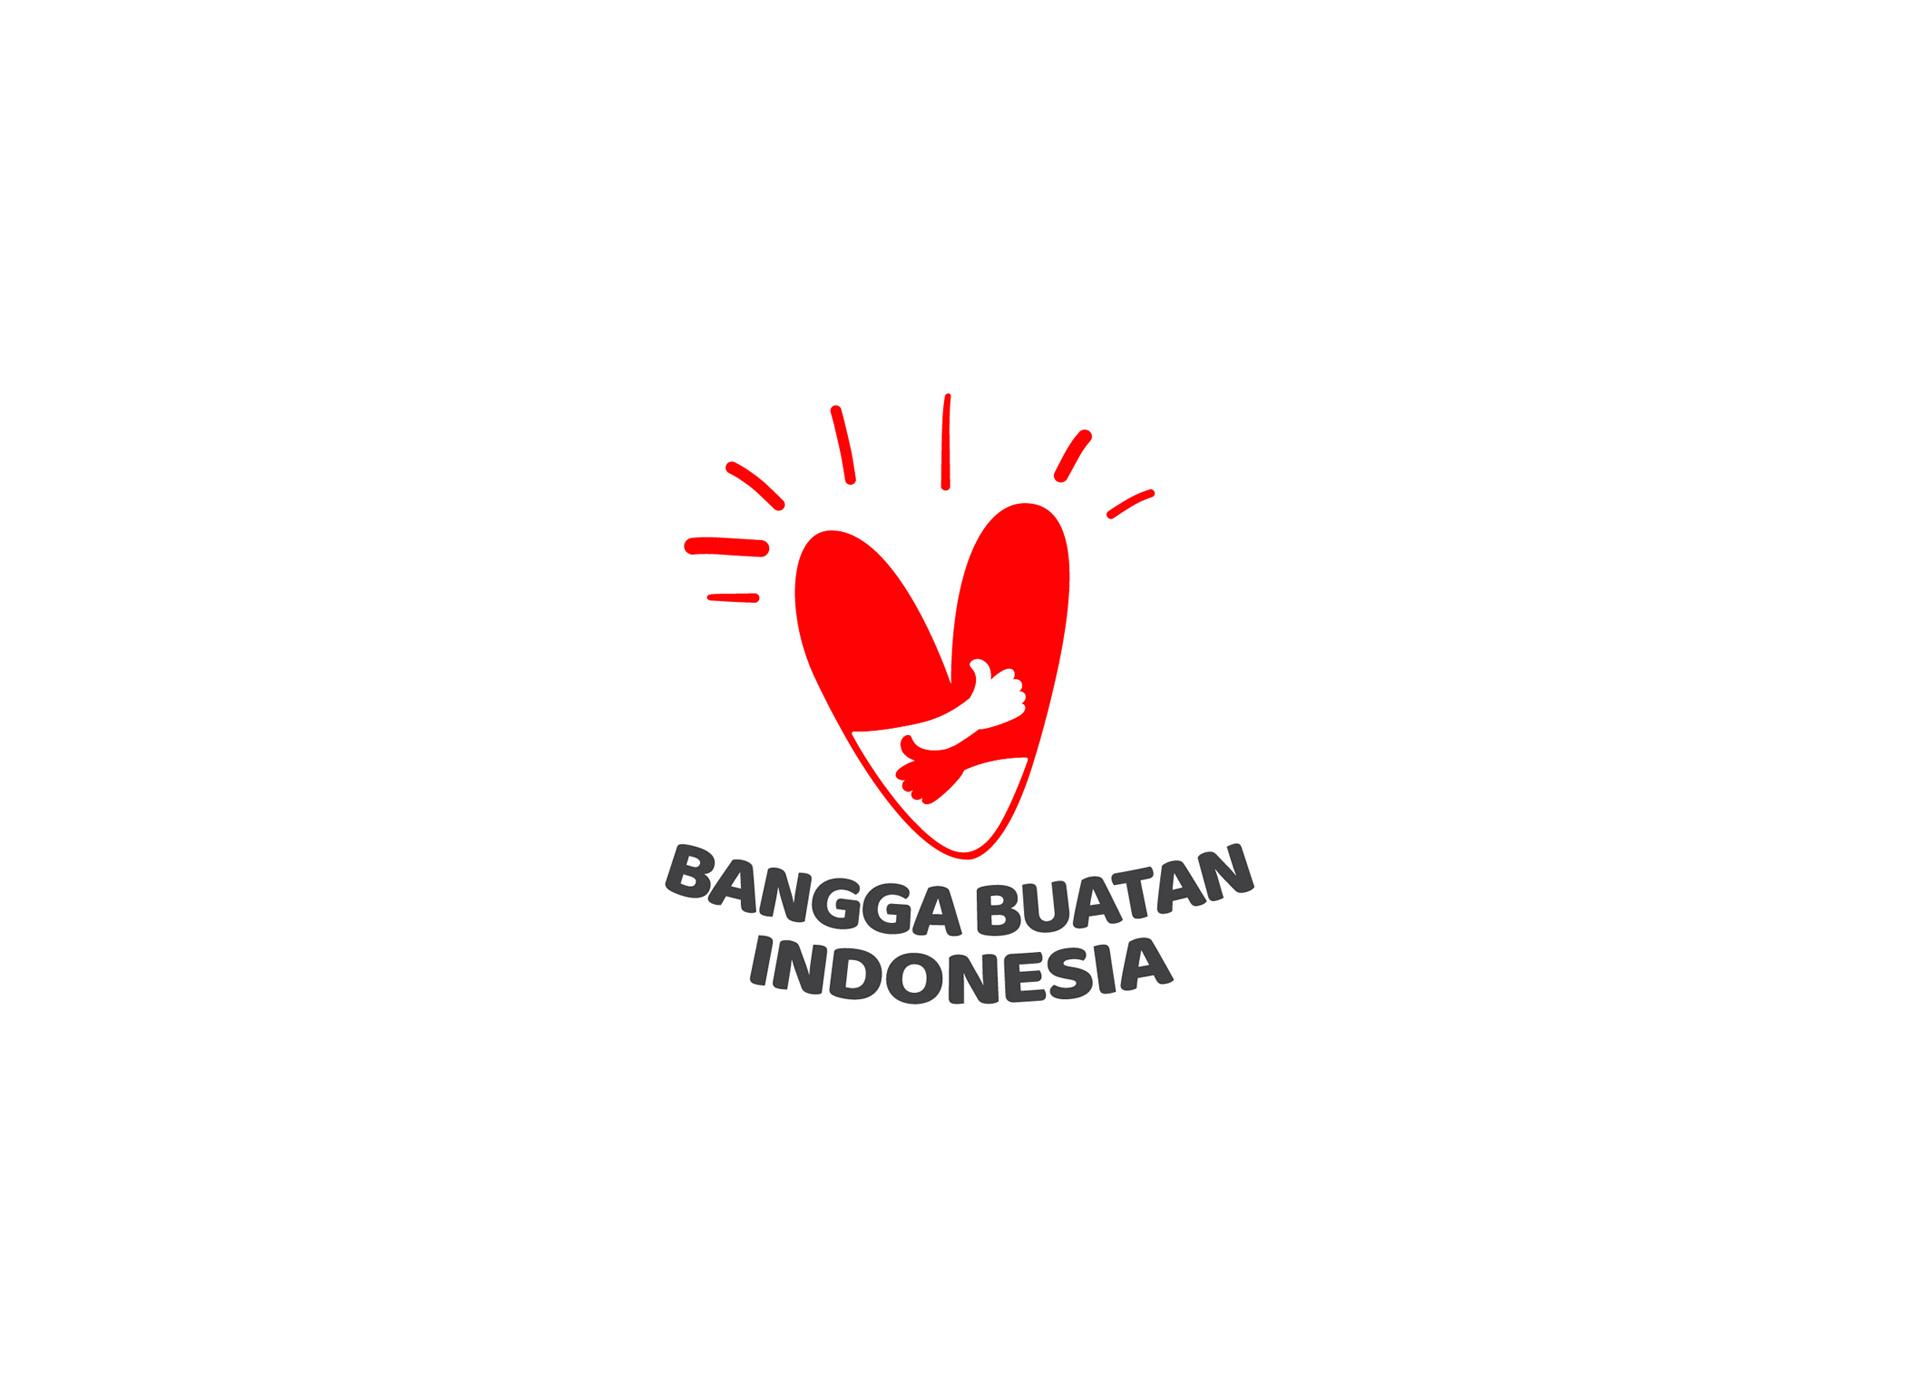 #BanggaBuatanIndonesia adalah sebuah gerakan dari pemerintah bersama berbagai perusahaan lainnya yang berada di bawah naungan Asosiasi E-Commerce Indonesia (idEA). Gerakan ini dicanangkan oleh Presiden Joko Widodo dan jajaran Kementeriannya yang bertujuan untuk mendorong sektor Usaha Mikro, Kecil, dan Menengah (UMKM) untuk go digital dan memperluas jangkauan pasar UMKM hingga ke pelosok daerah di Indonesia.